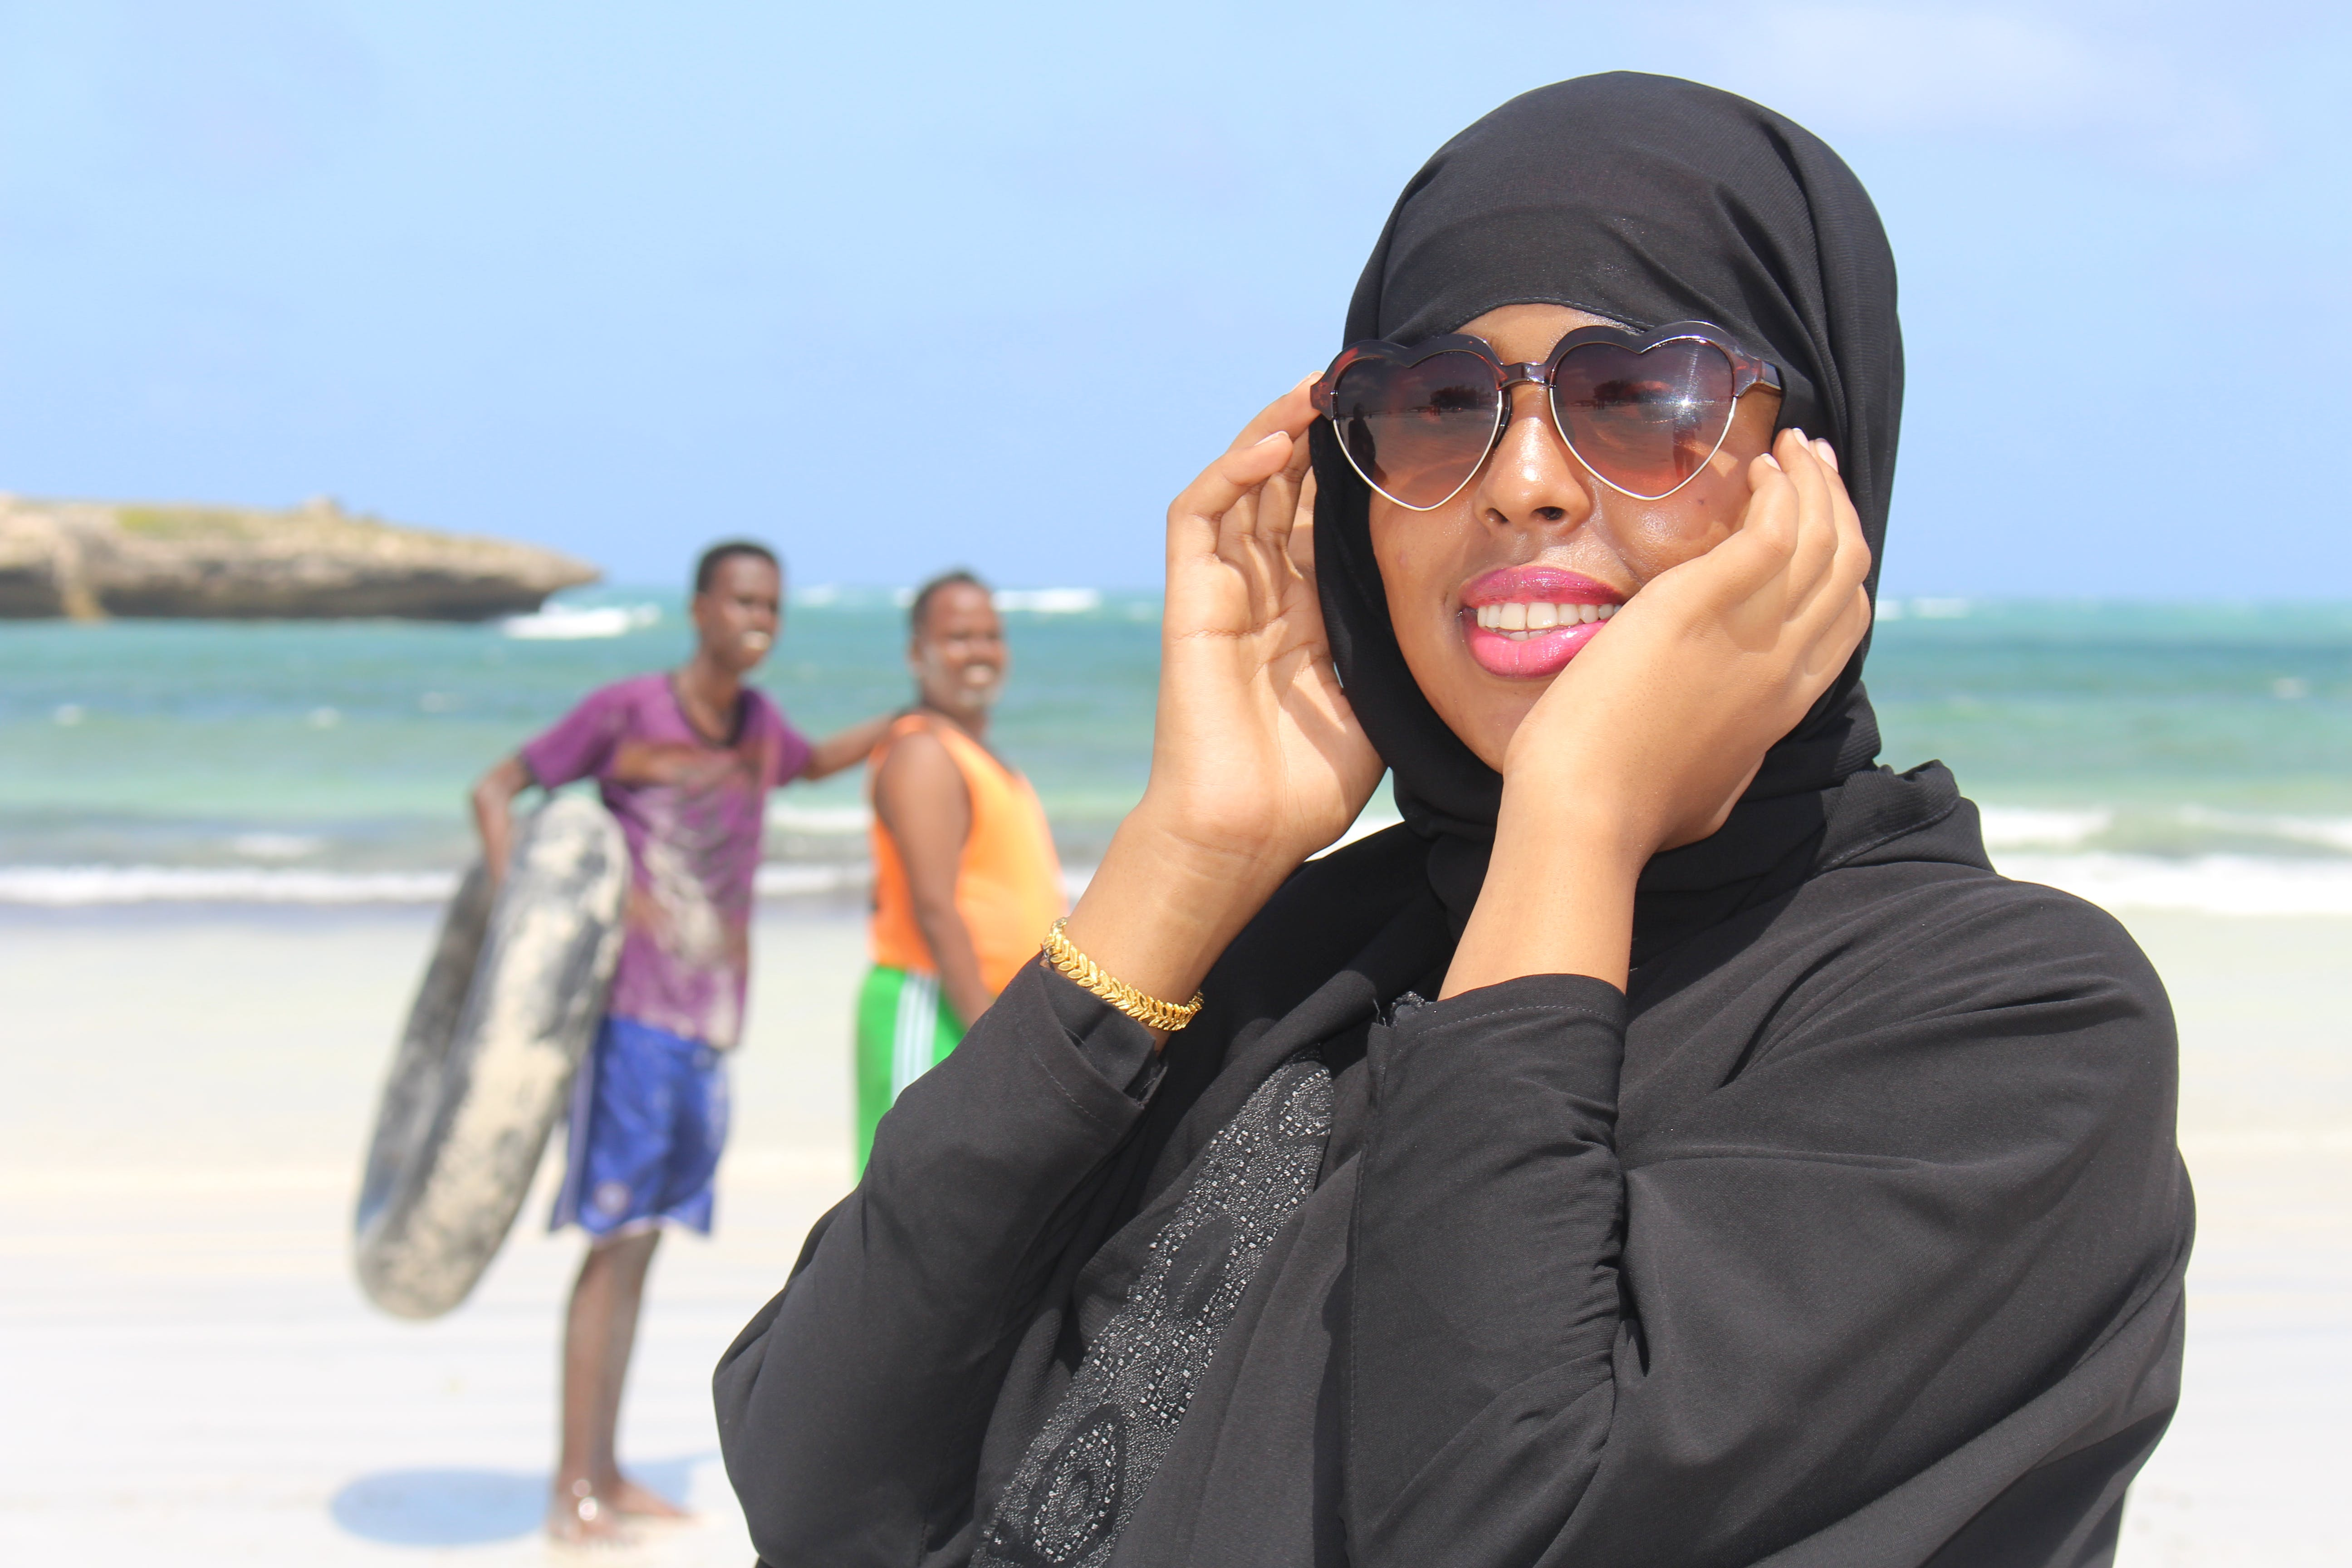 Woman Wearing Black Abaya Dress Holding Her